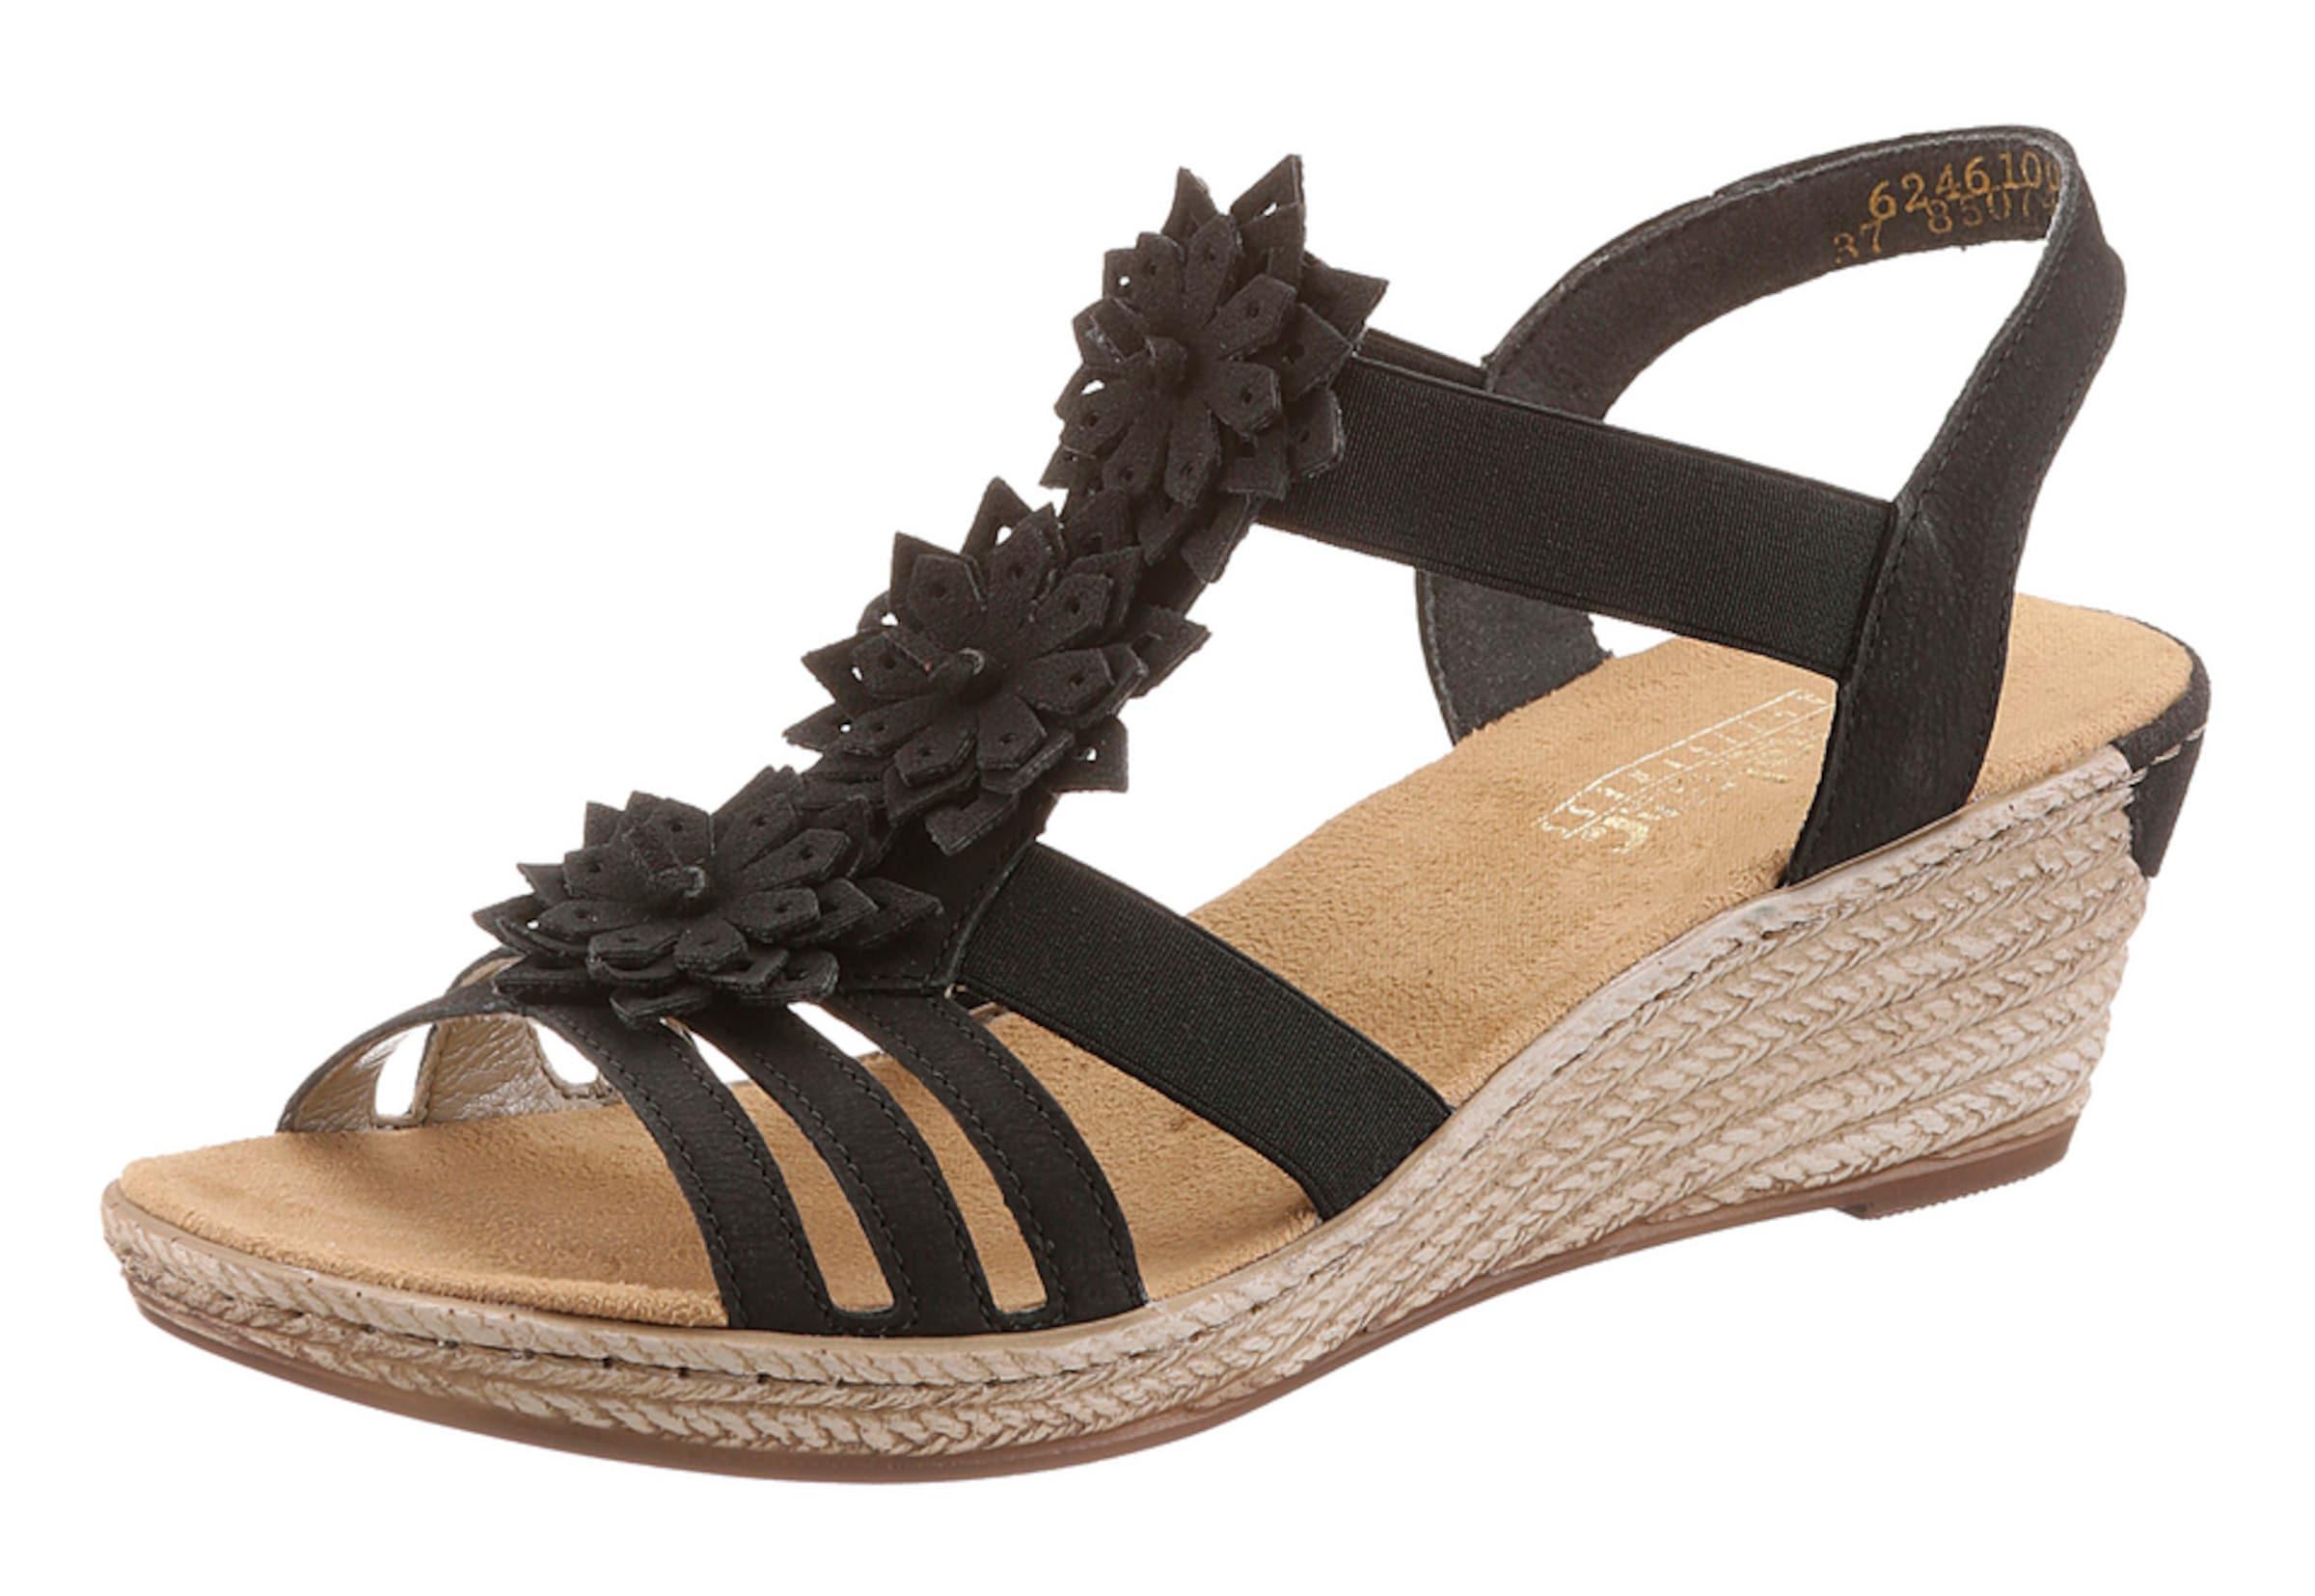 RIEKER Sandaletten Günstige und langlebige Schuhe